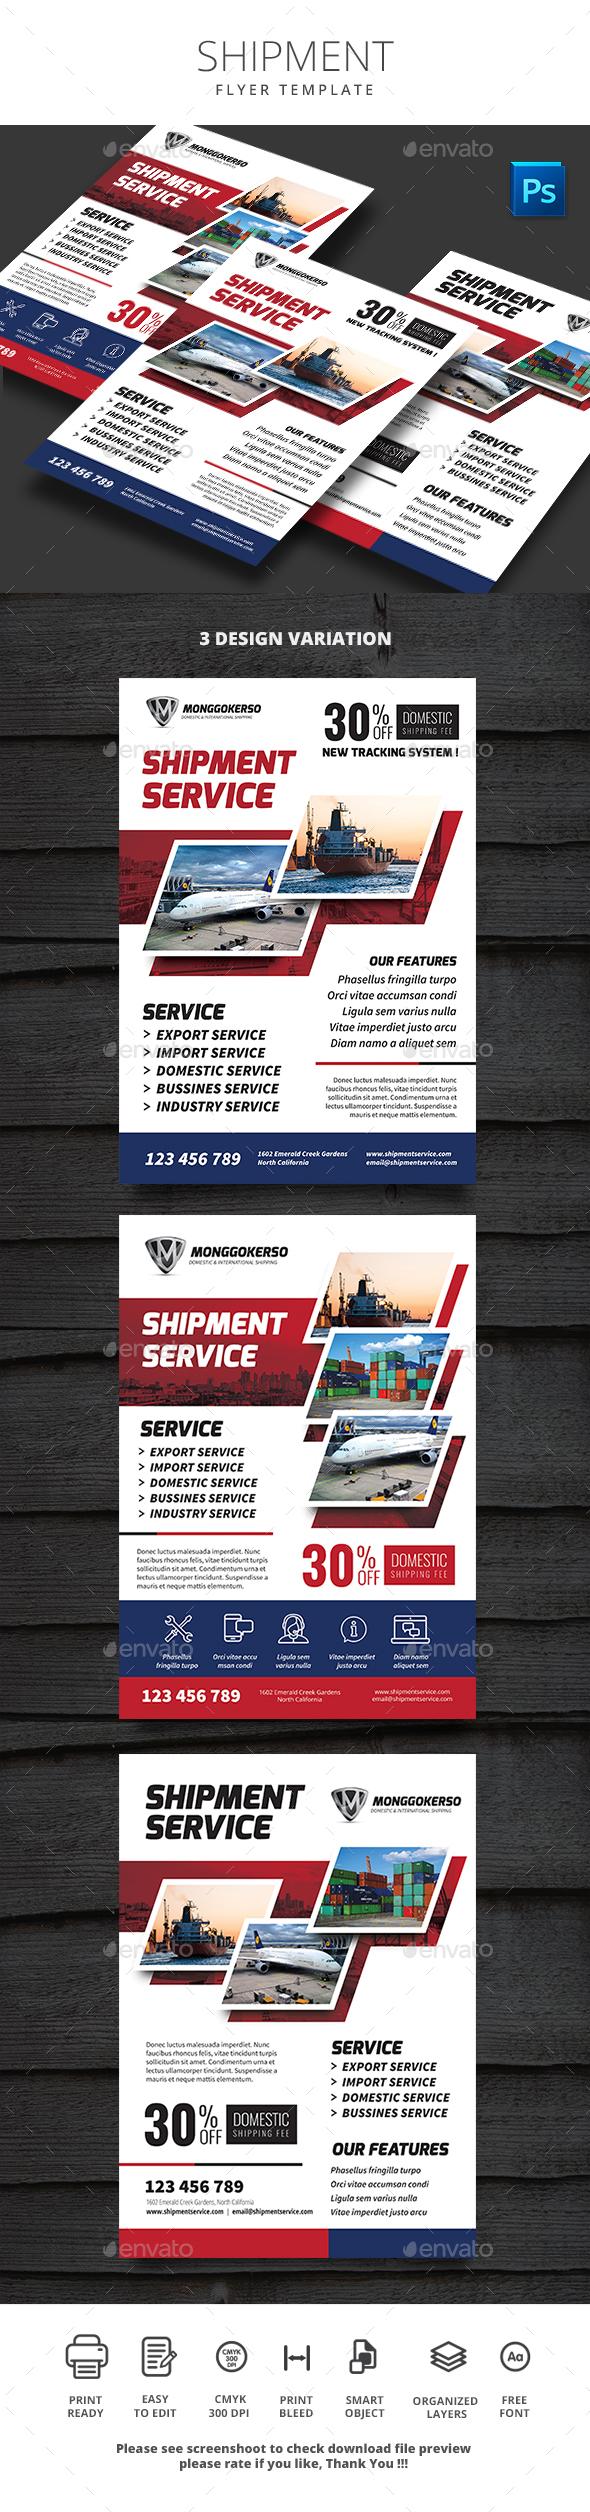 Shipment - Flyers Print Templates